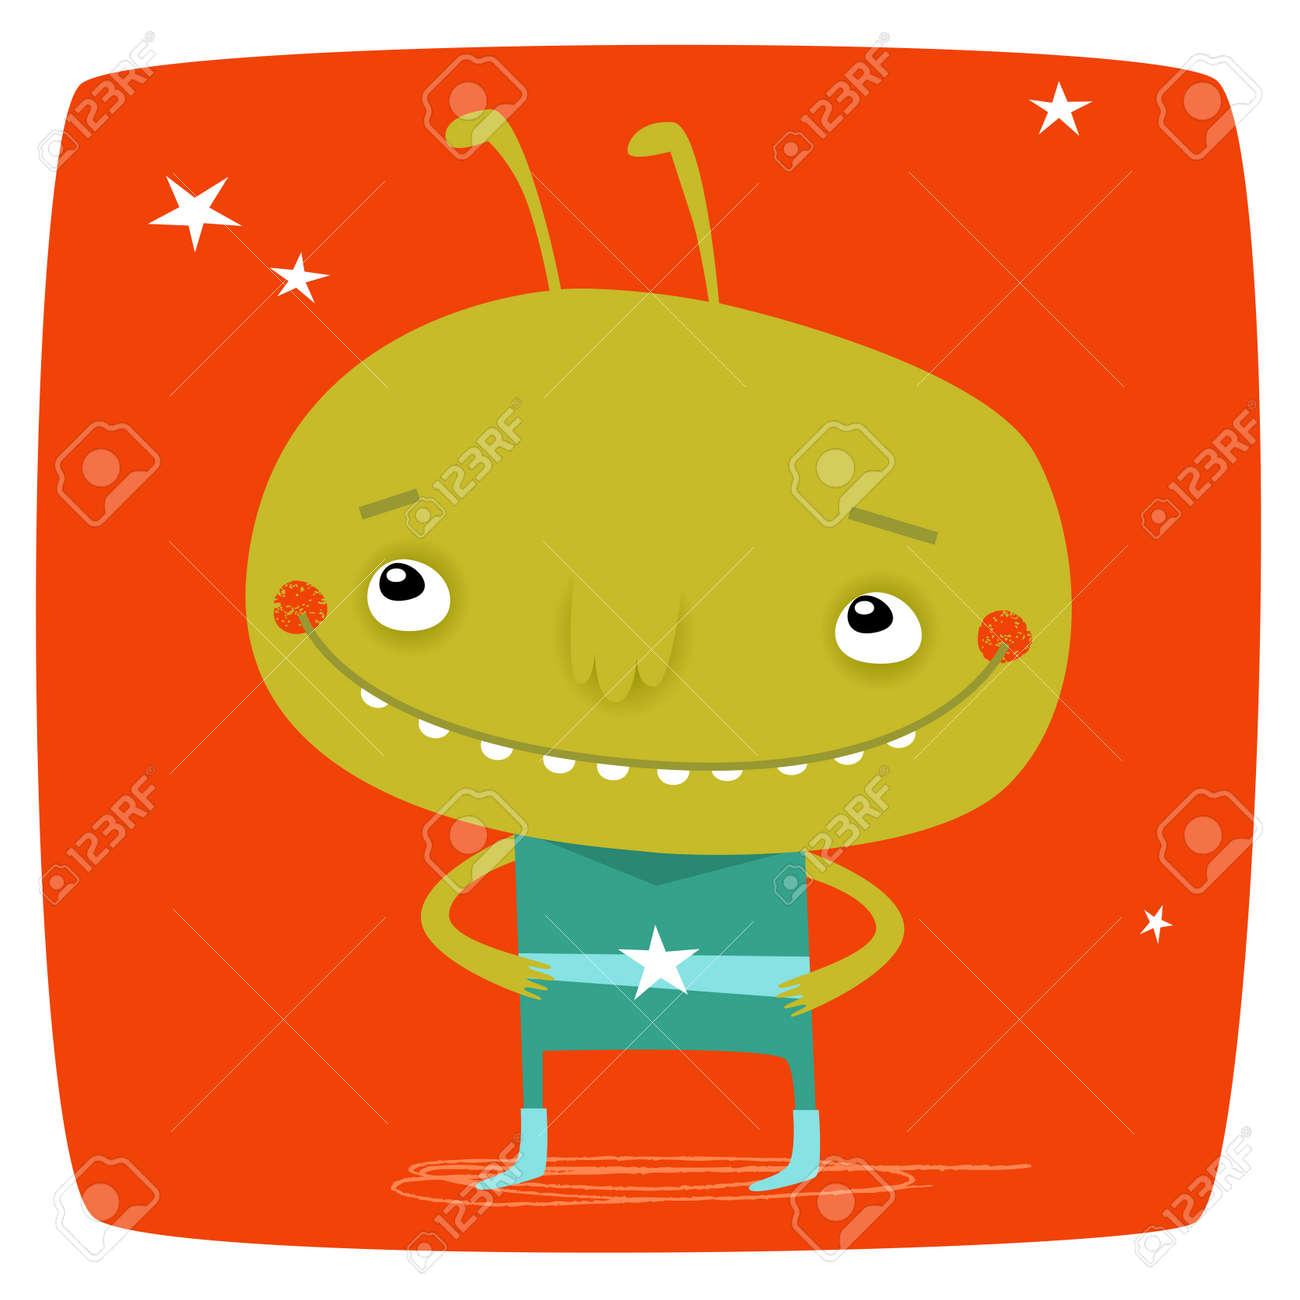 Little Alien Stock Vector - 18996525